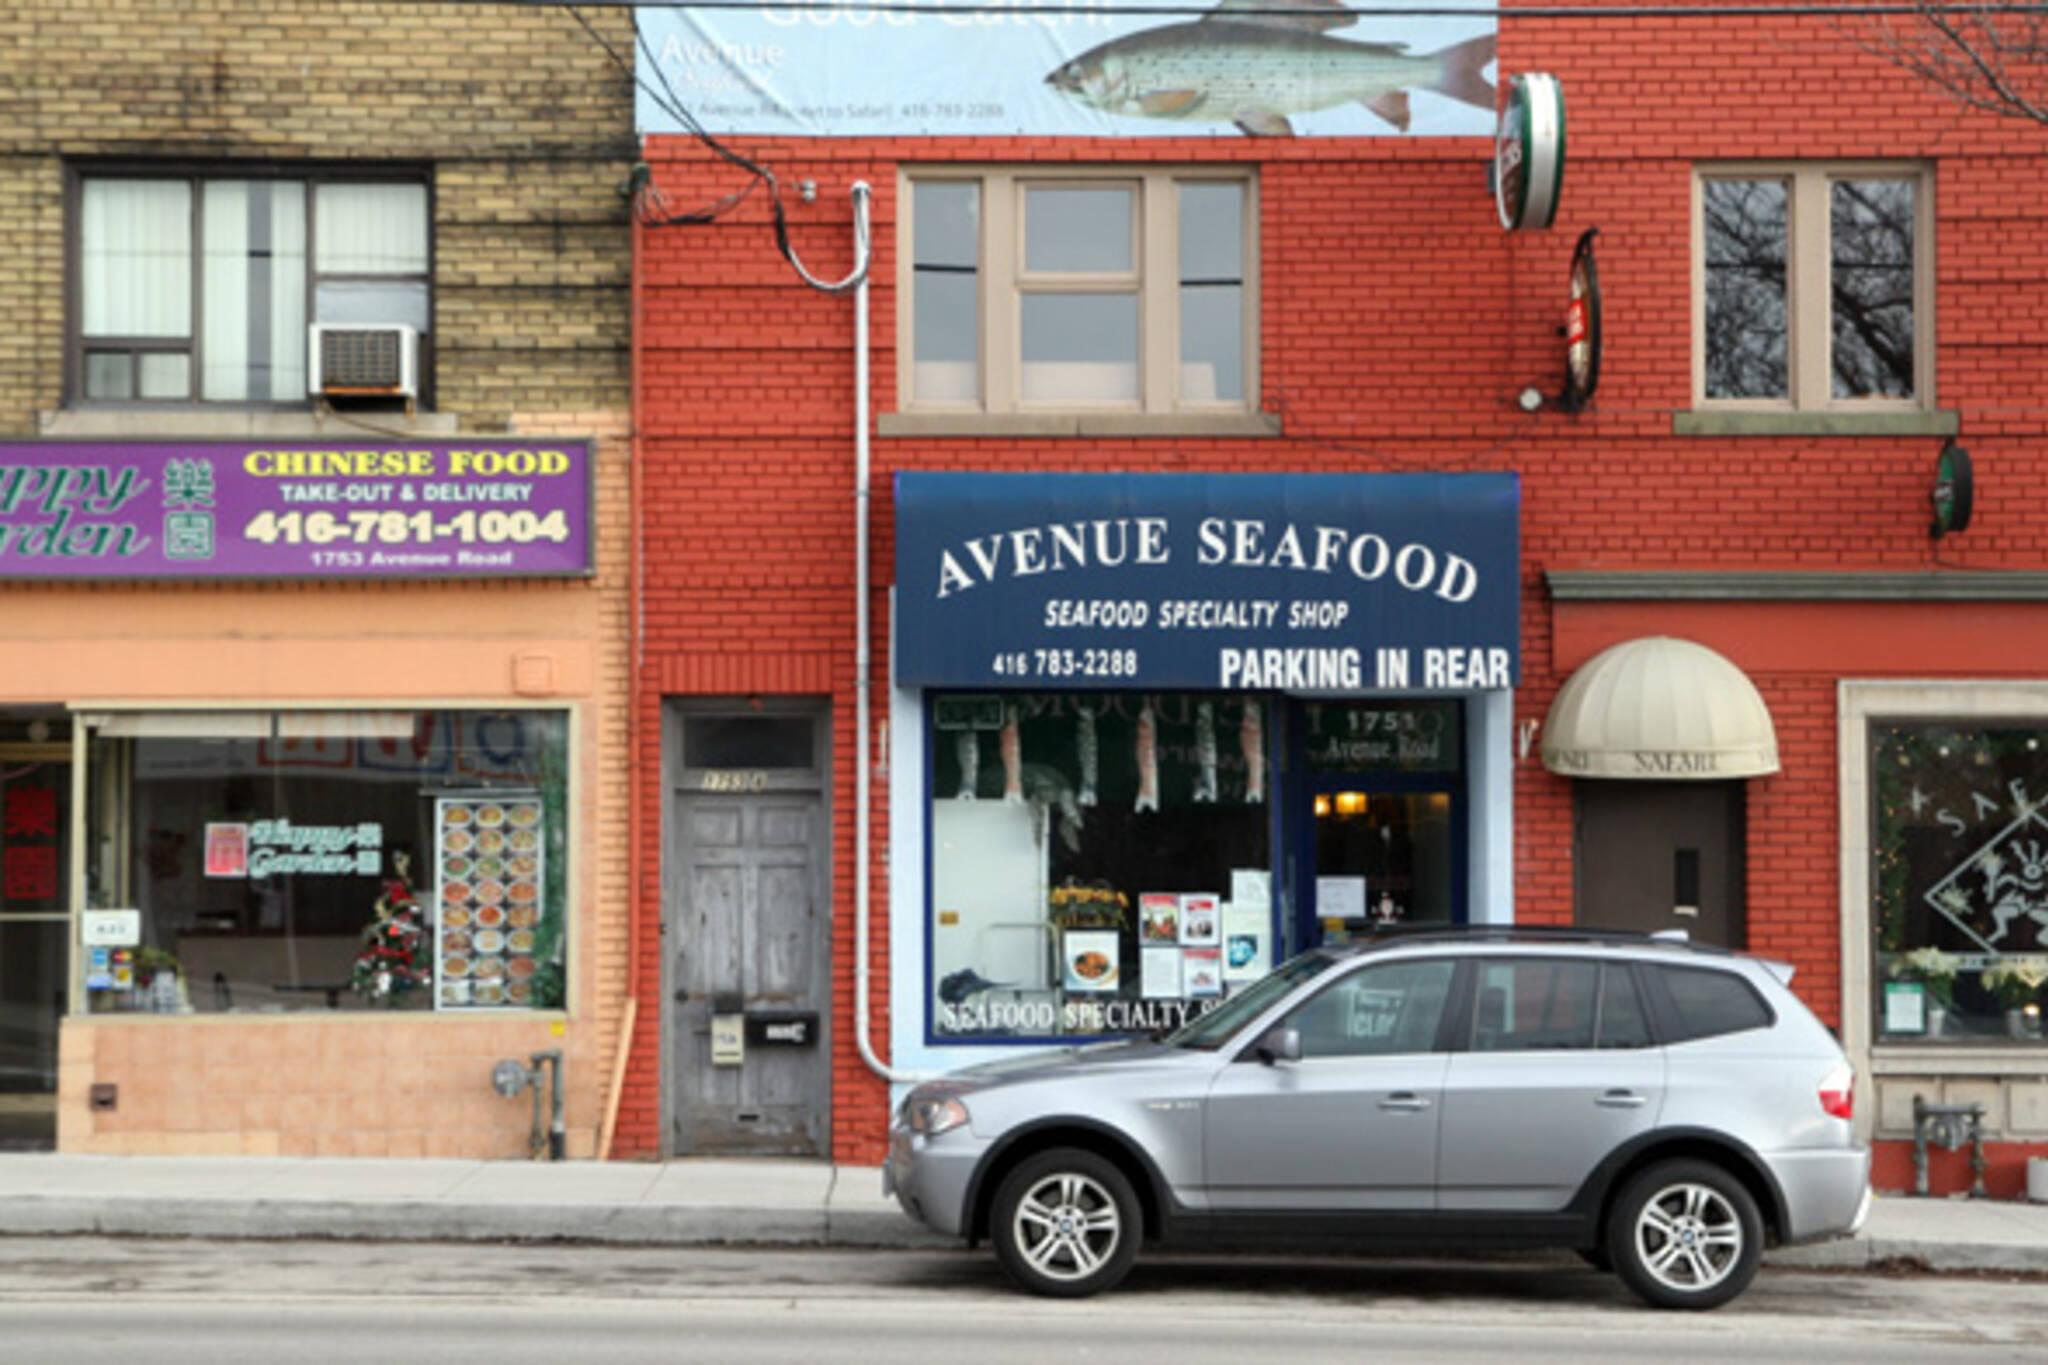 Avenue Seafood